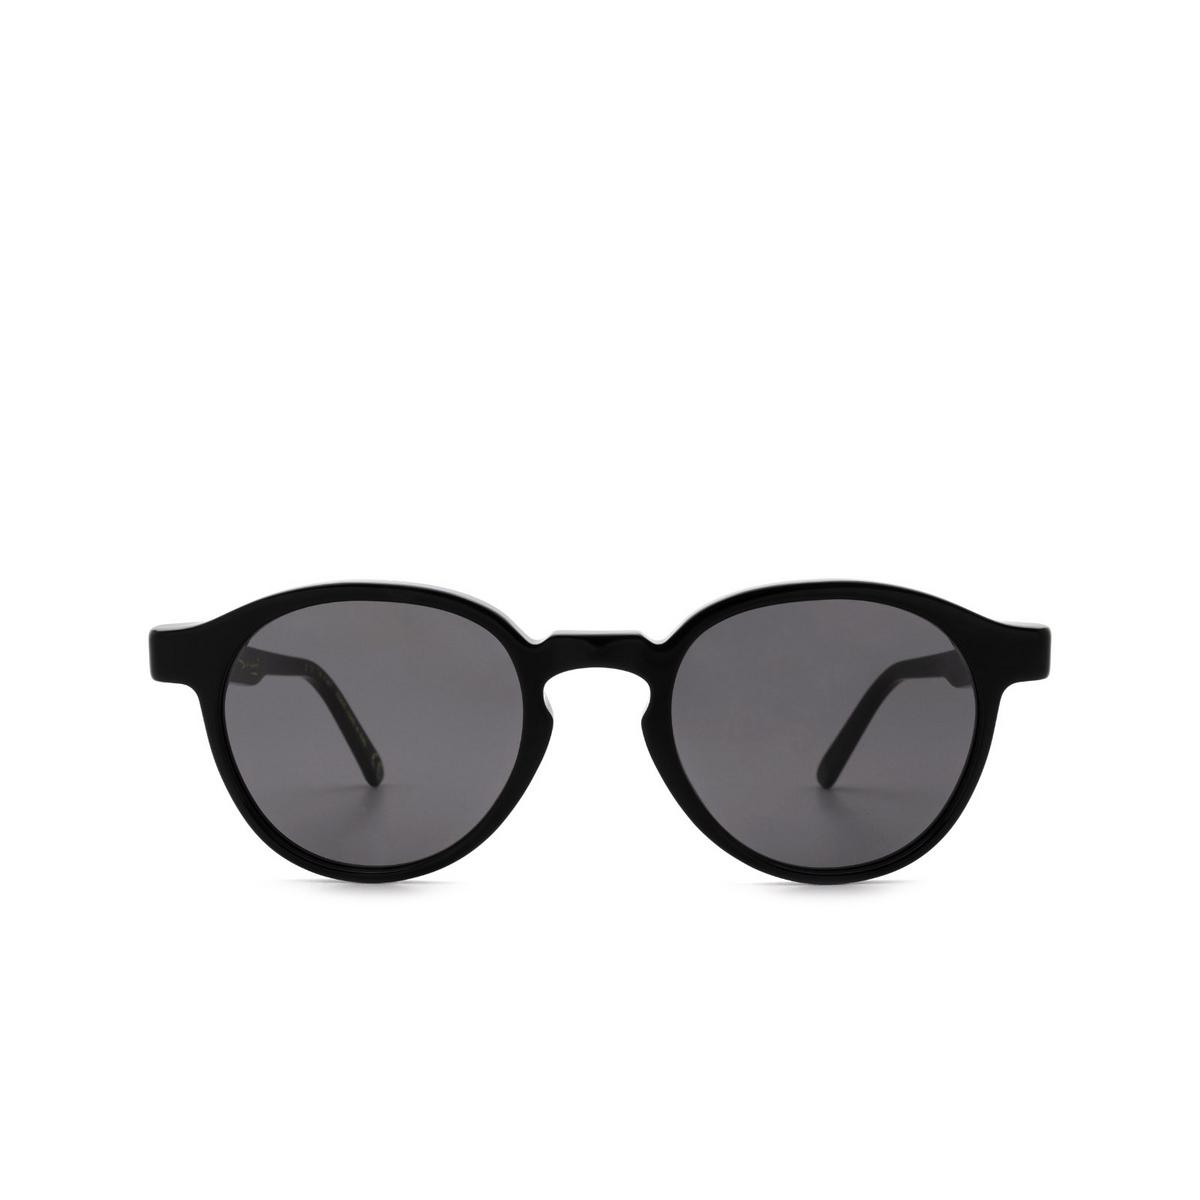 Retrosuperfuture® Round Sunglasses: The Warhol color Black 0Q7 - front view.